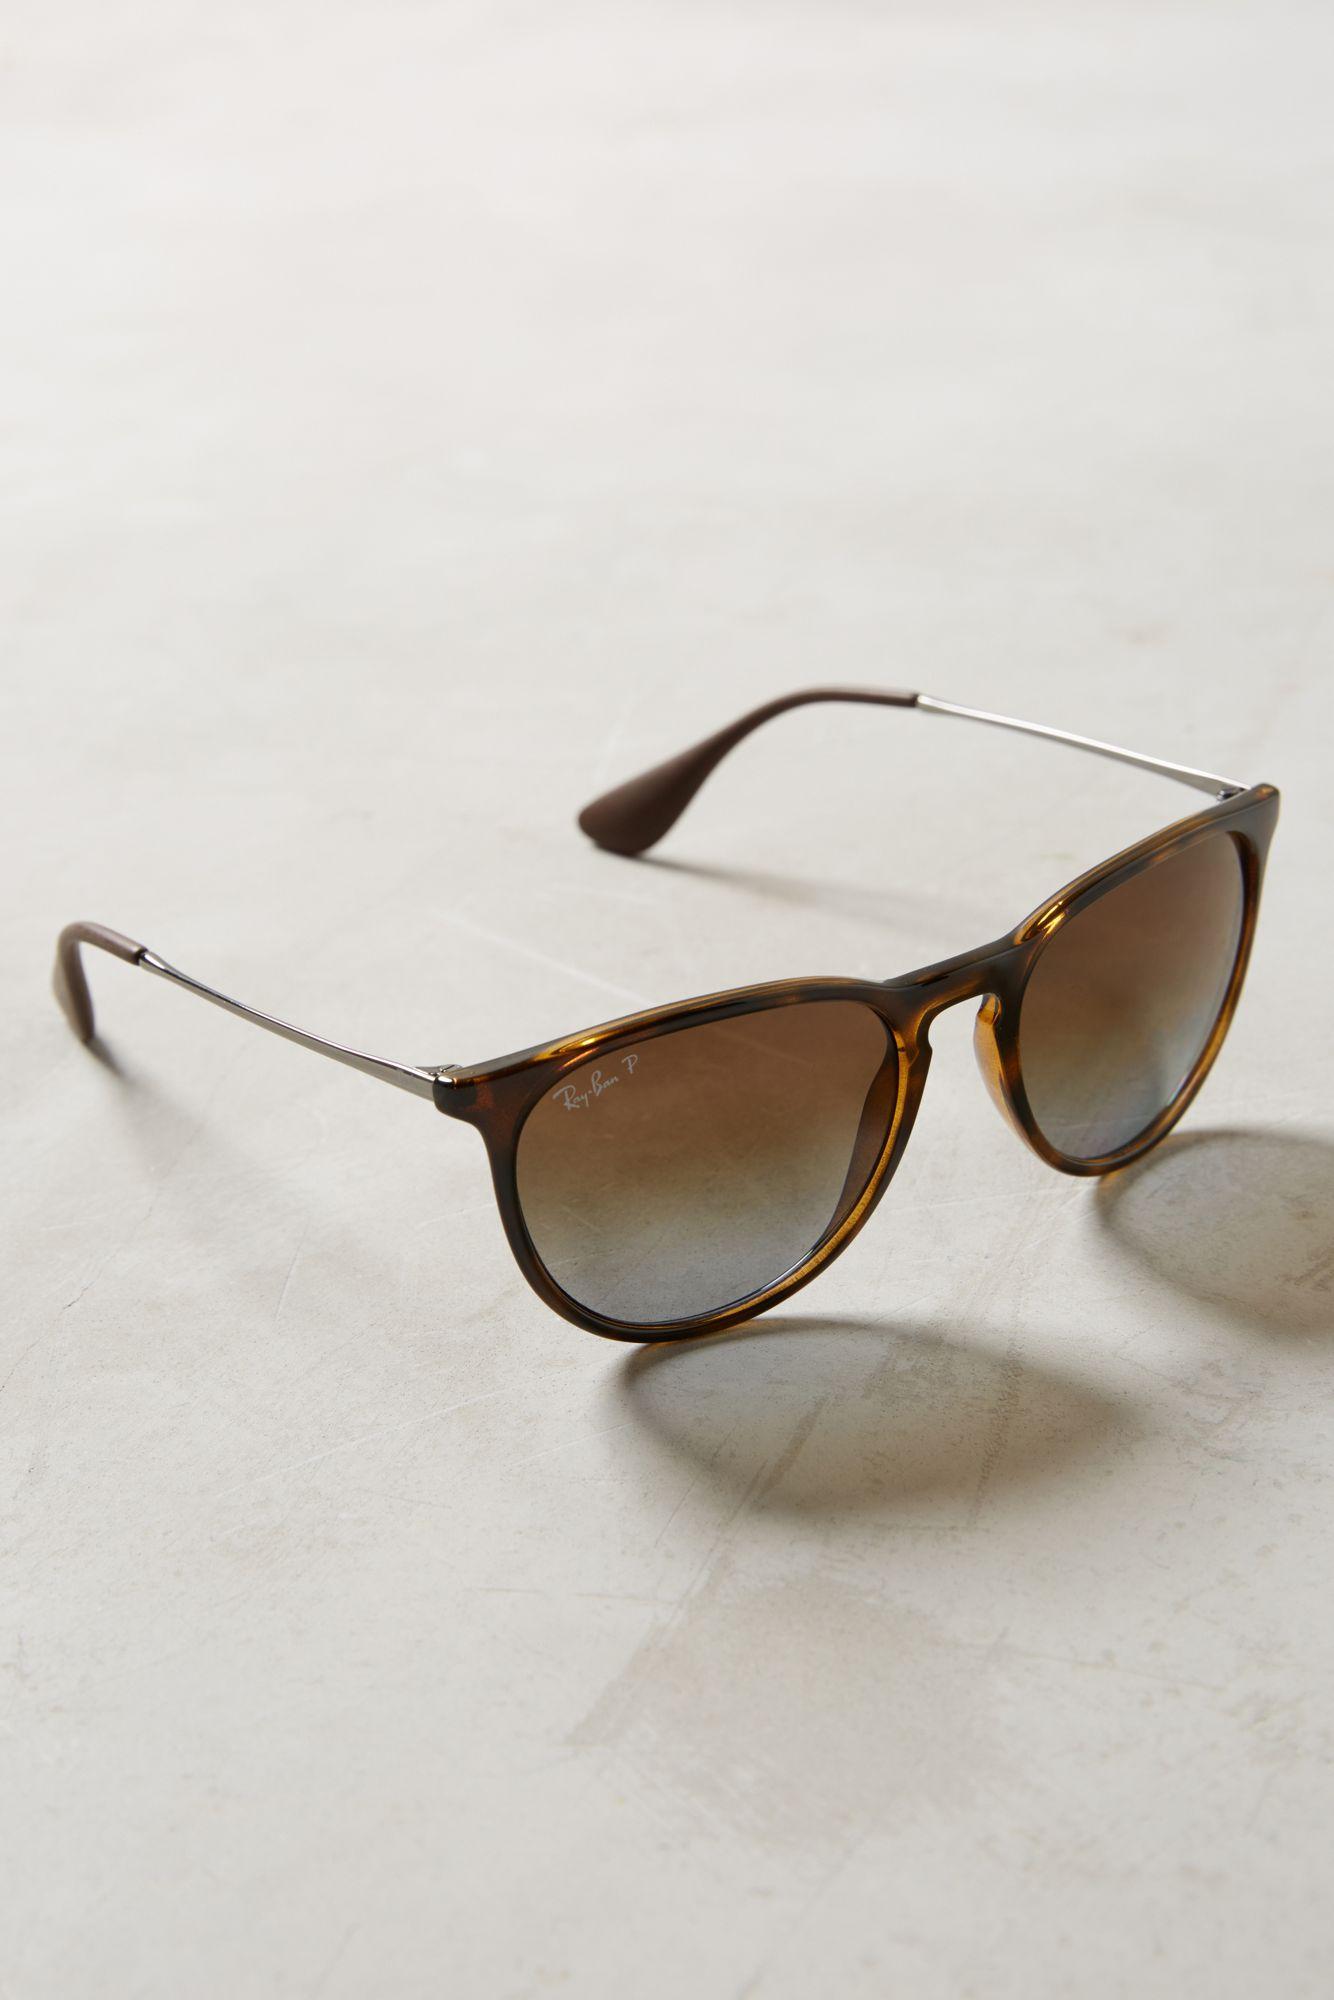 8f684de246624 Ray Ban Girls Sunglasses Erica « Heritage Malta